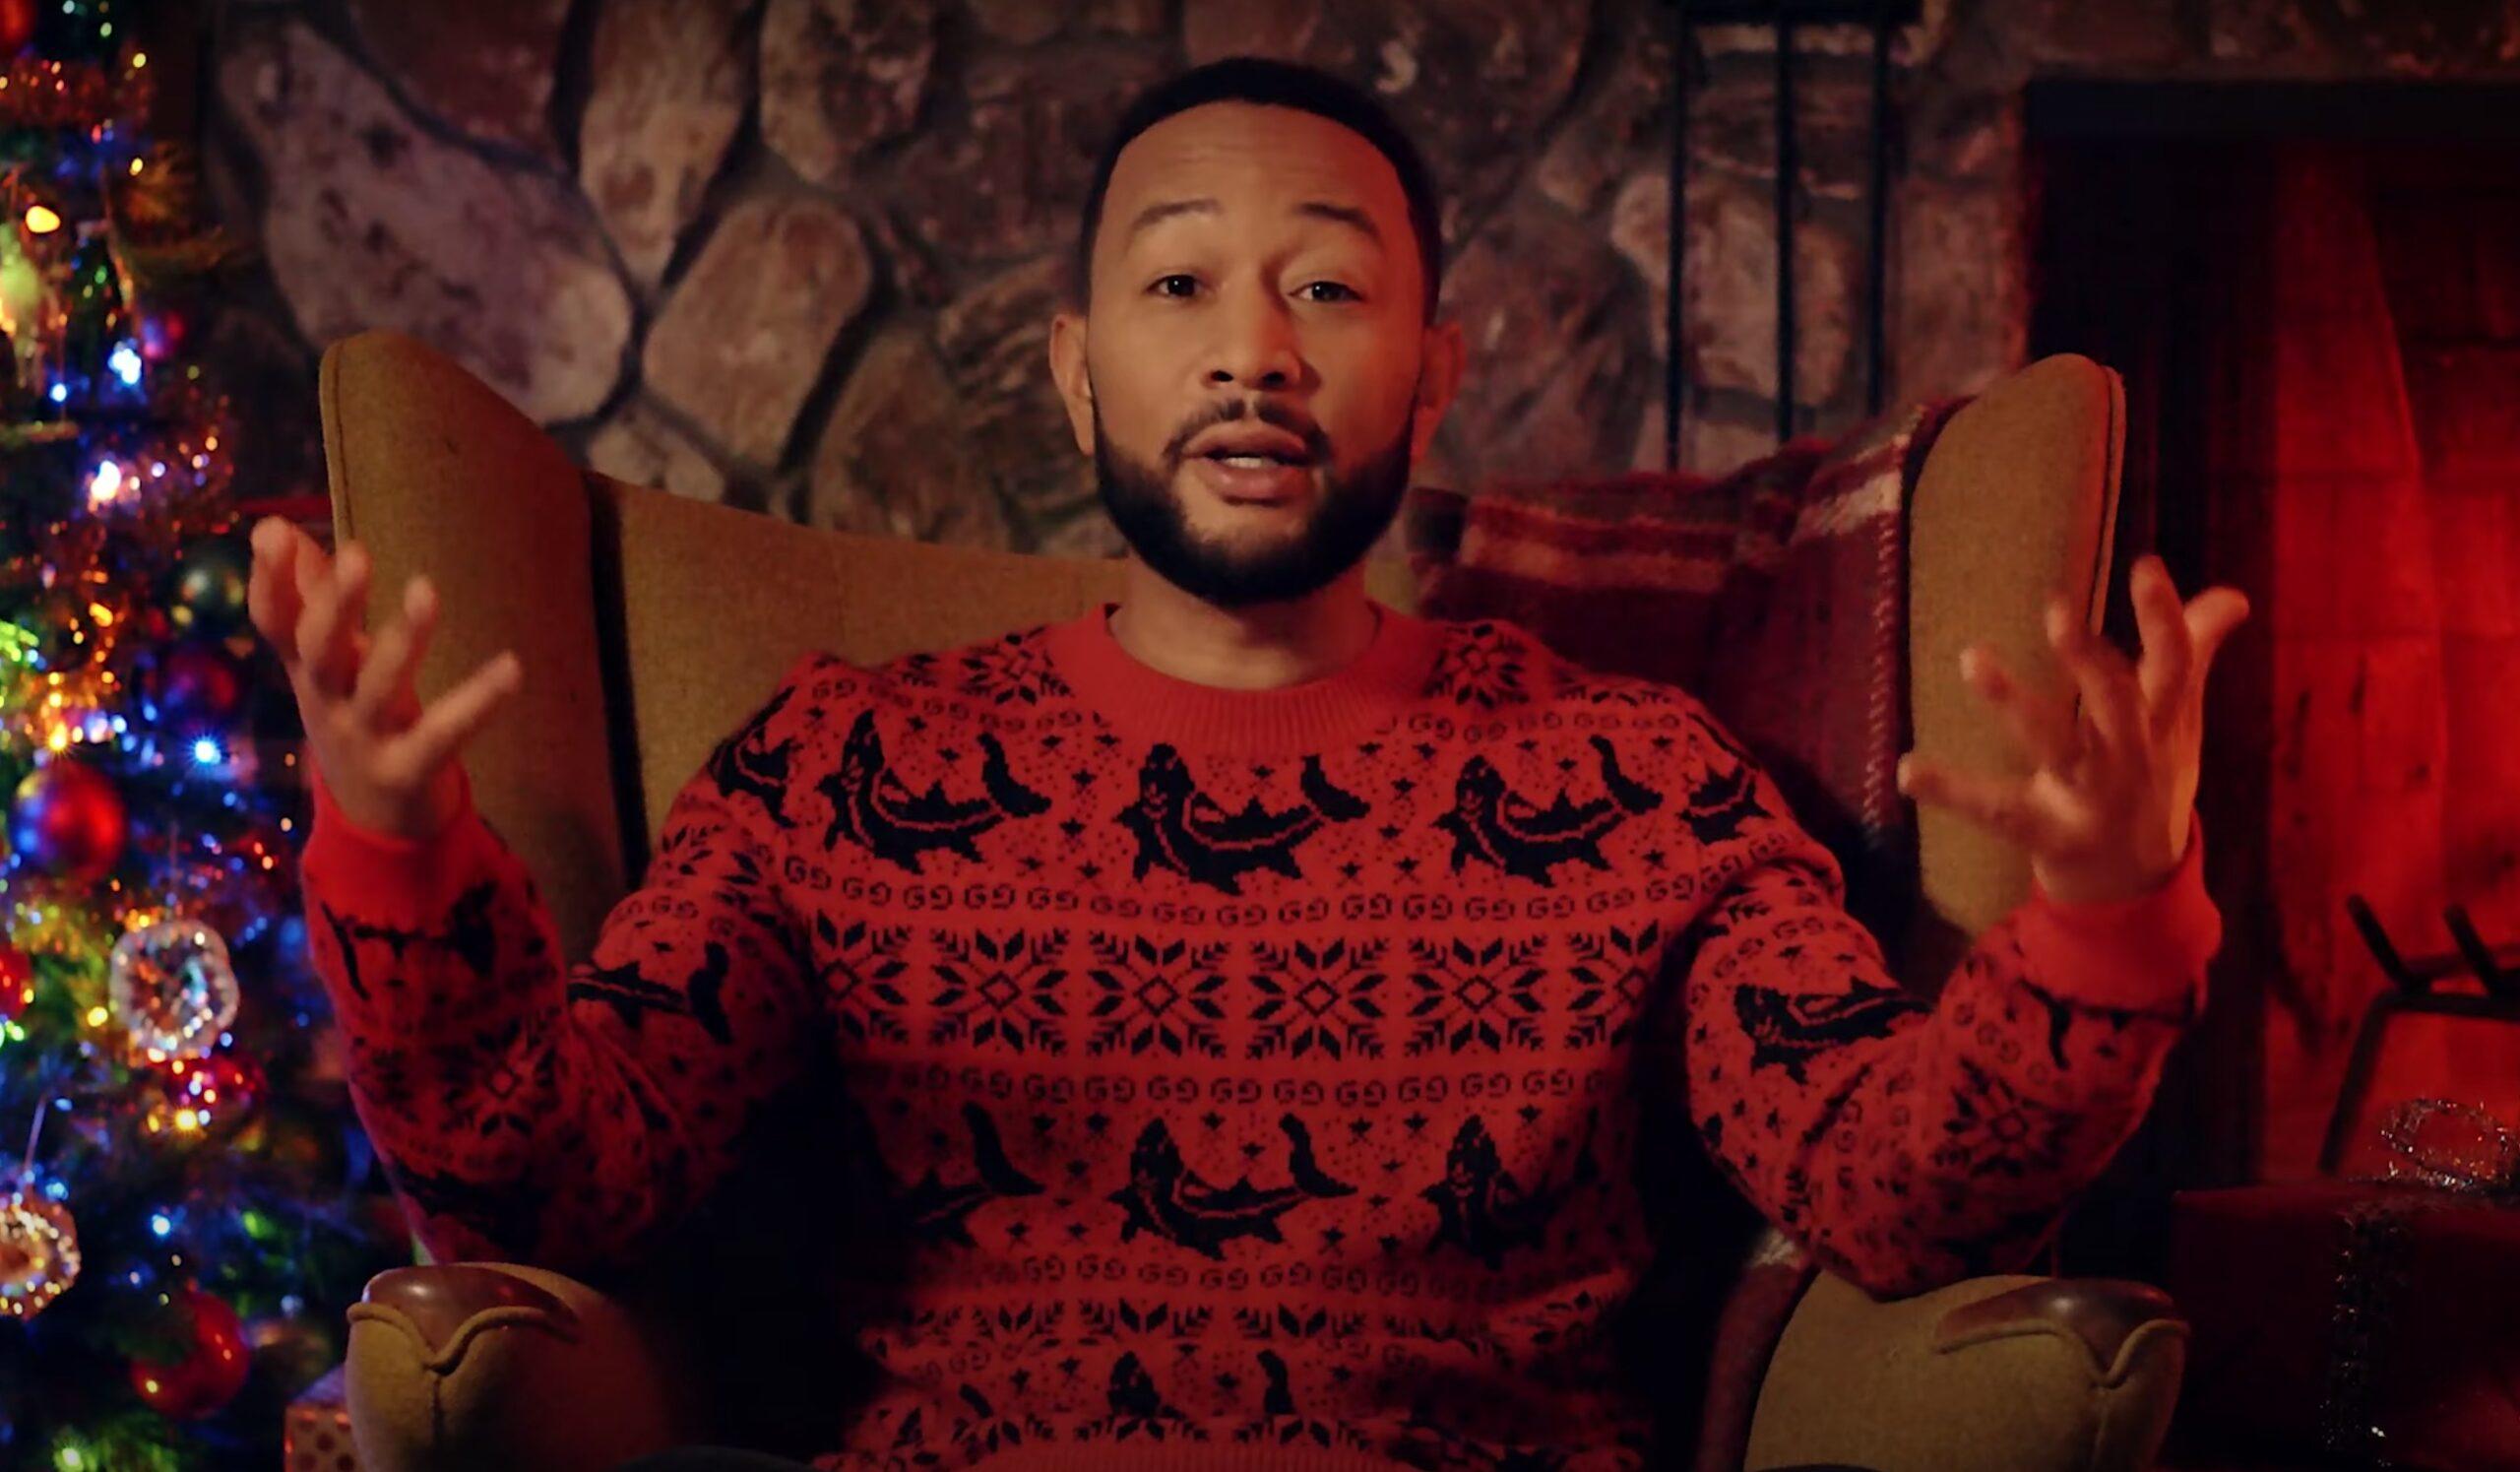 John Legend Christmas video